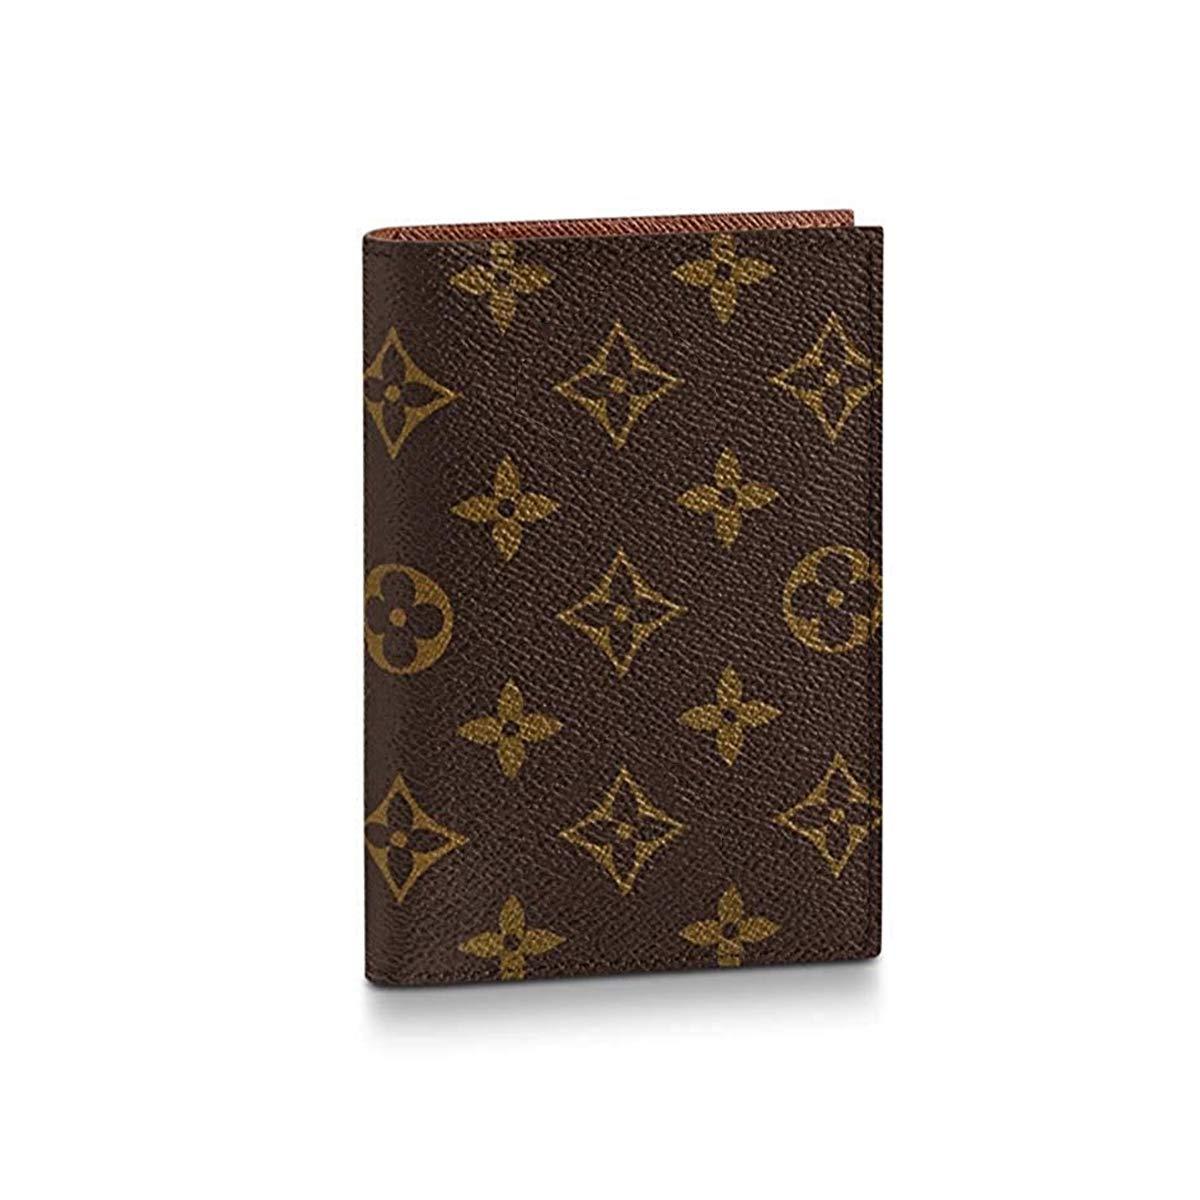 Xleoo Passport Cover Monogram M64502